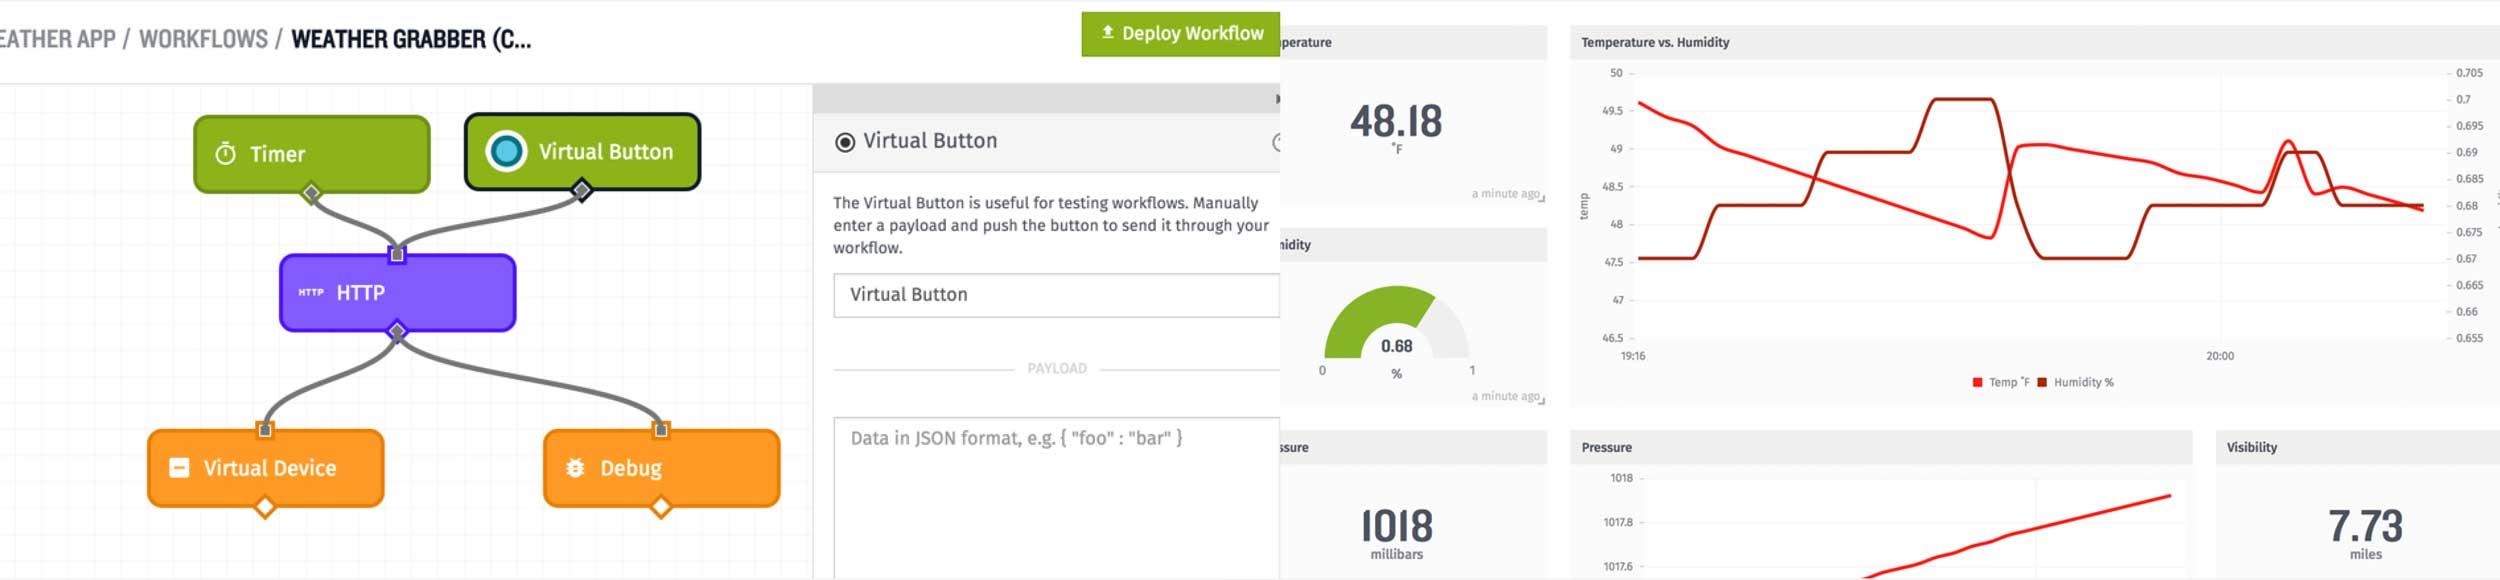 Losant IoT platform Workflows